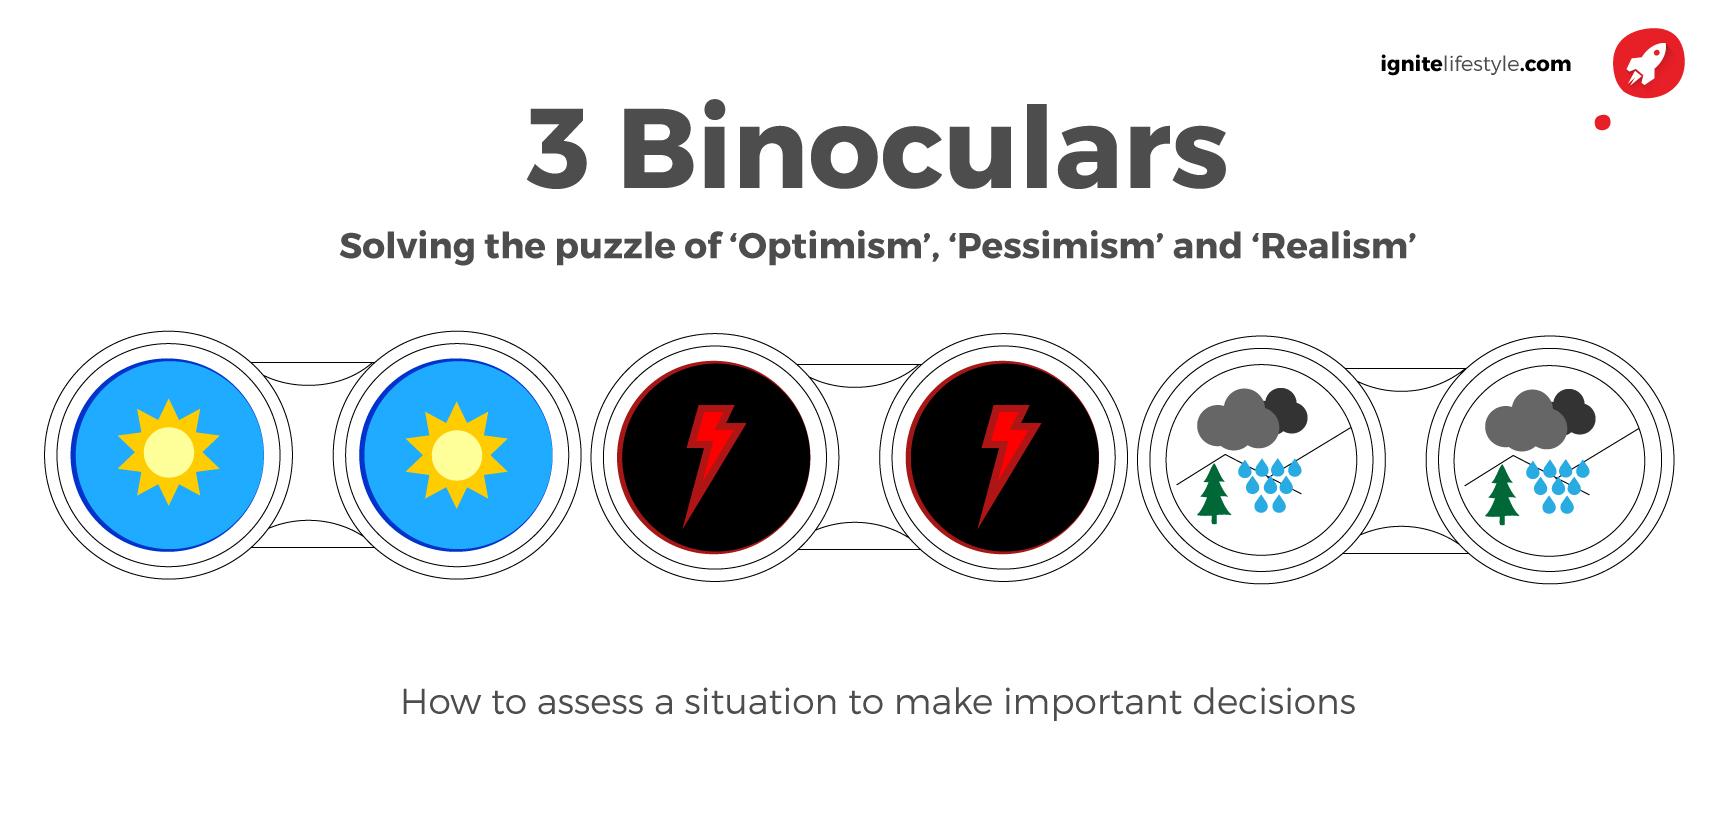 3 Binoculars : Solving The Puzzle of Pessimism,Optimism & Realism